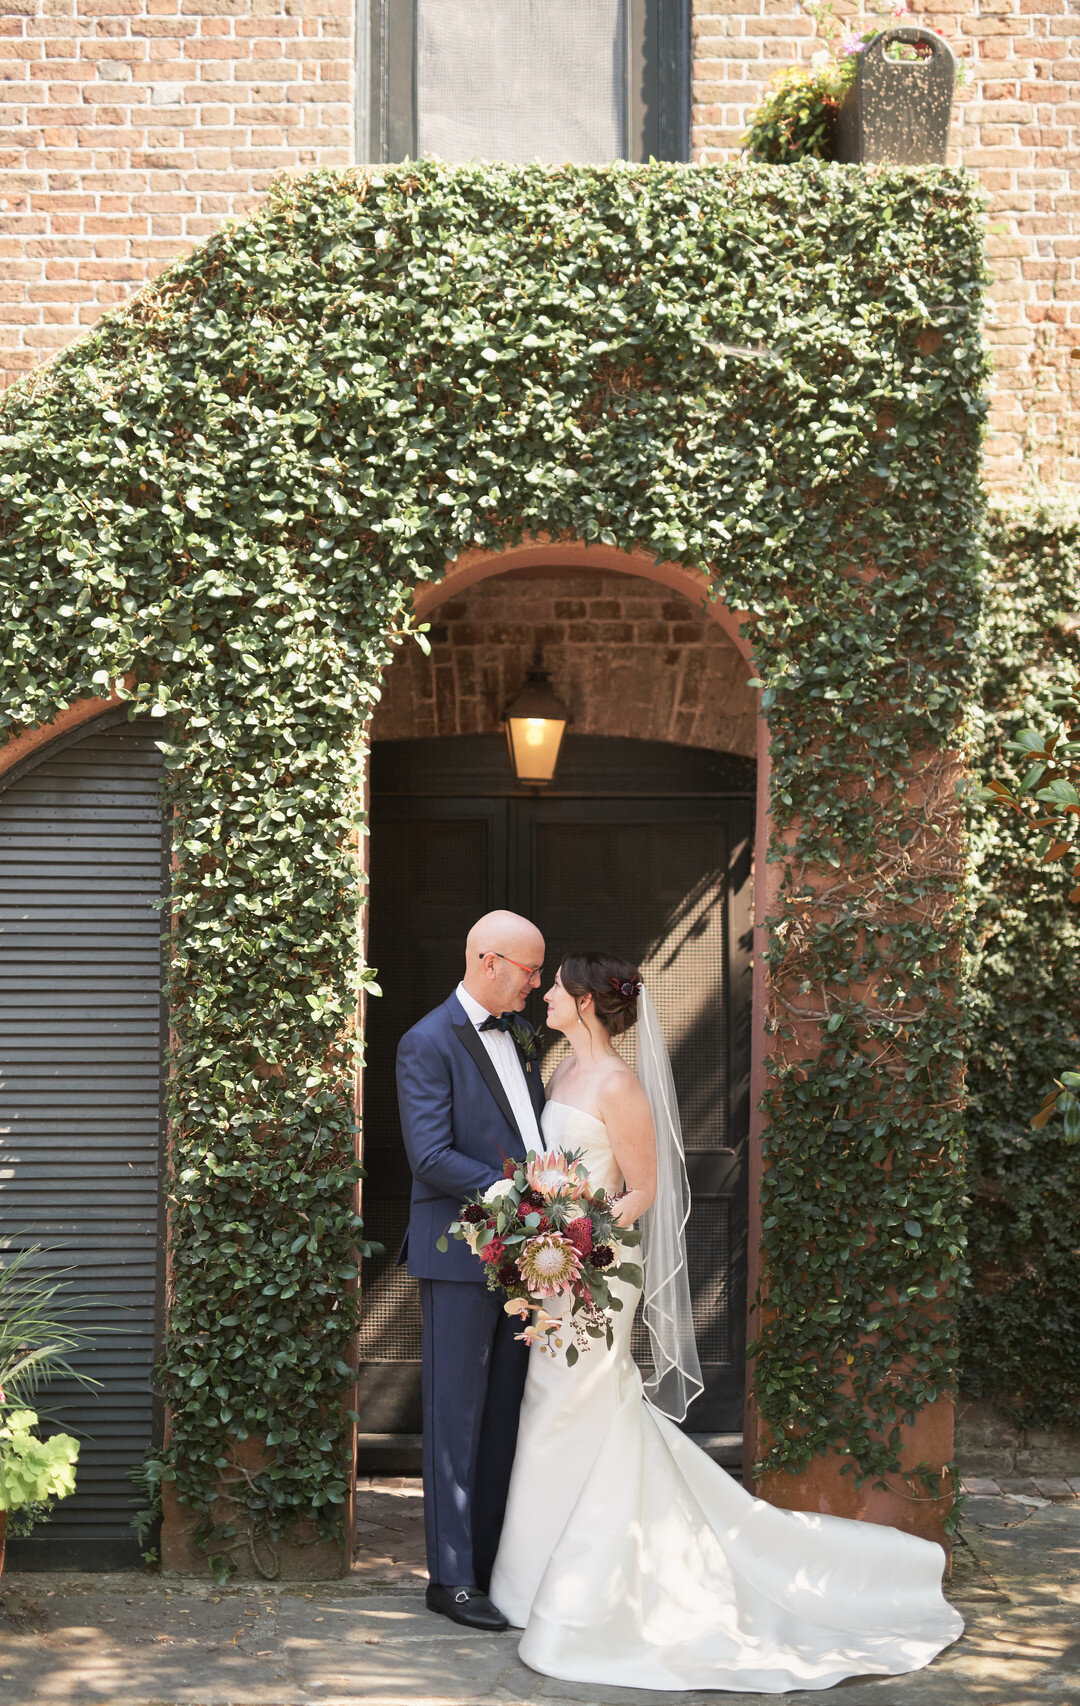 restoration-hotel-wedding-8.jpg